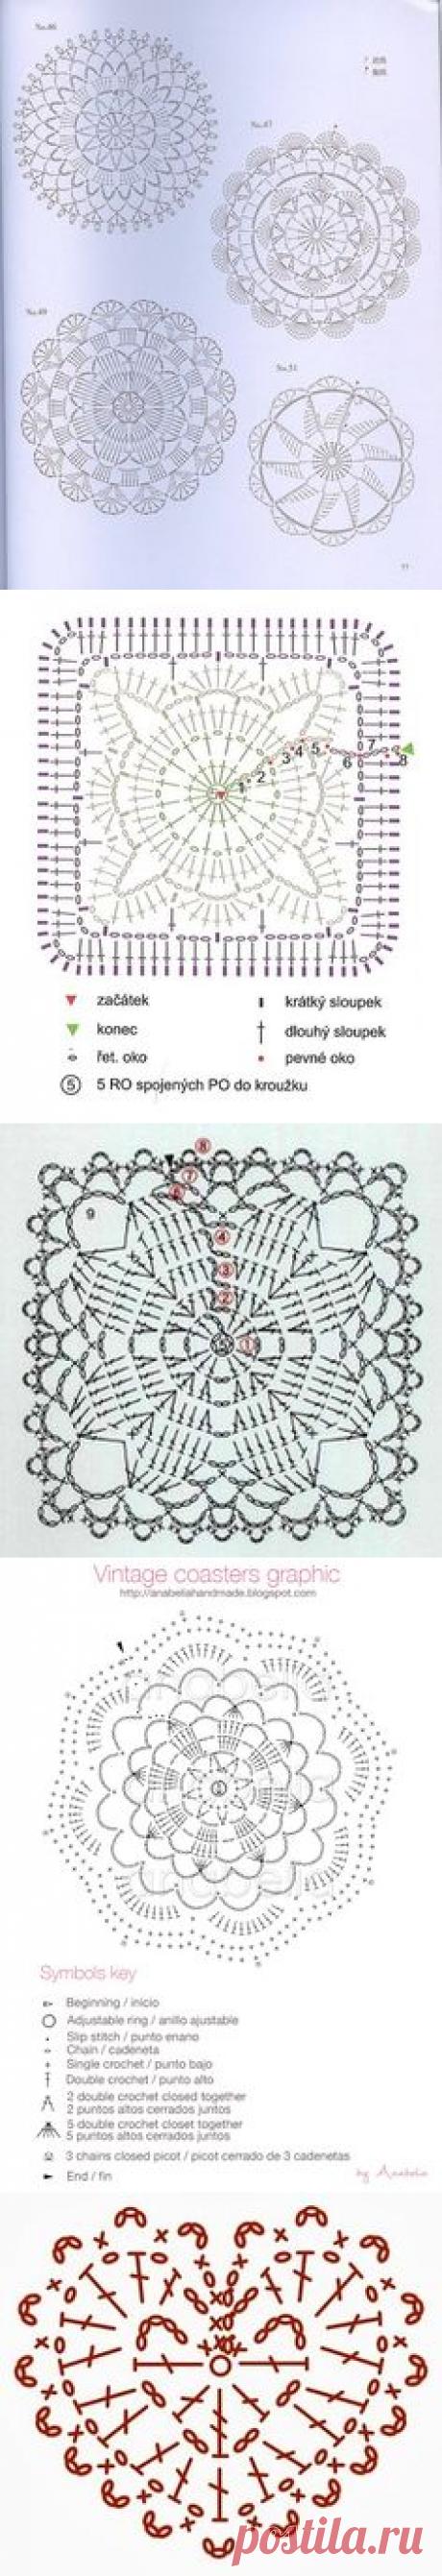 (6) Crochet pattern в Pinterest